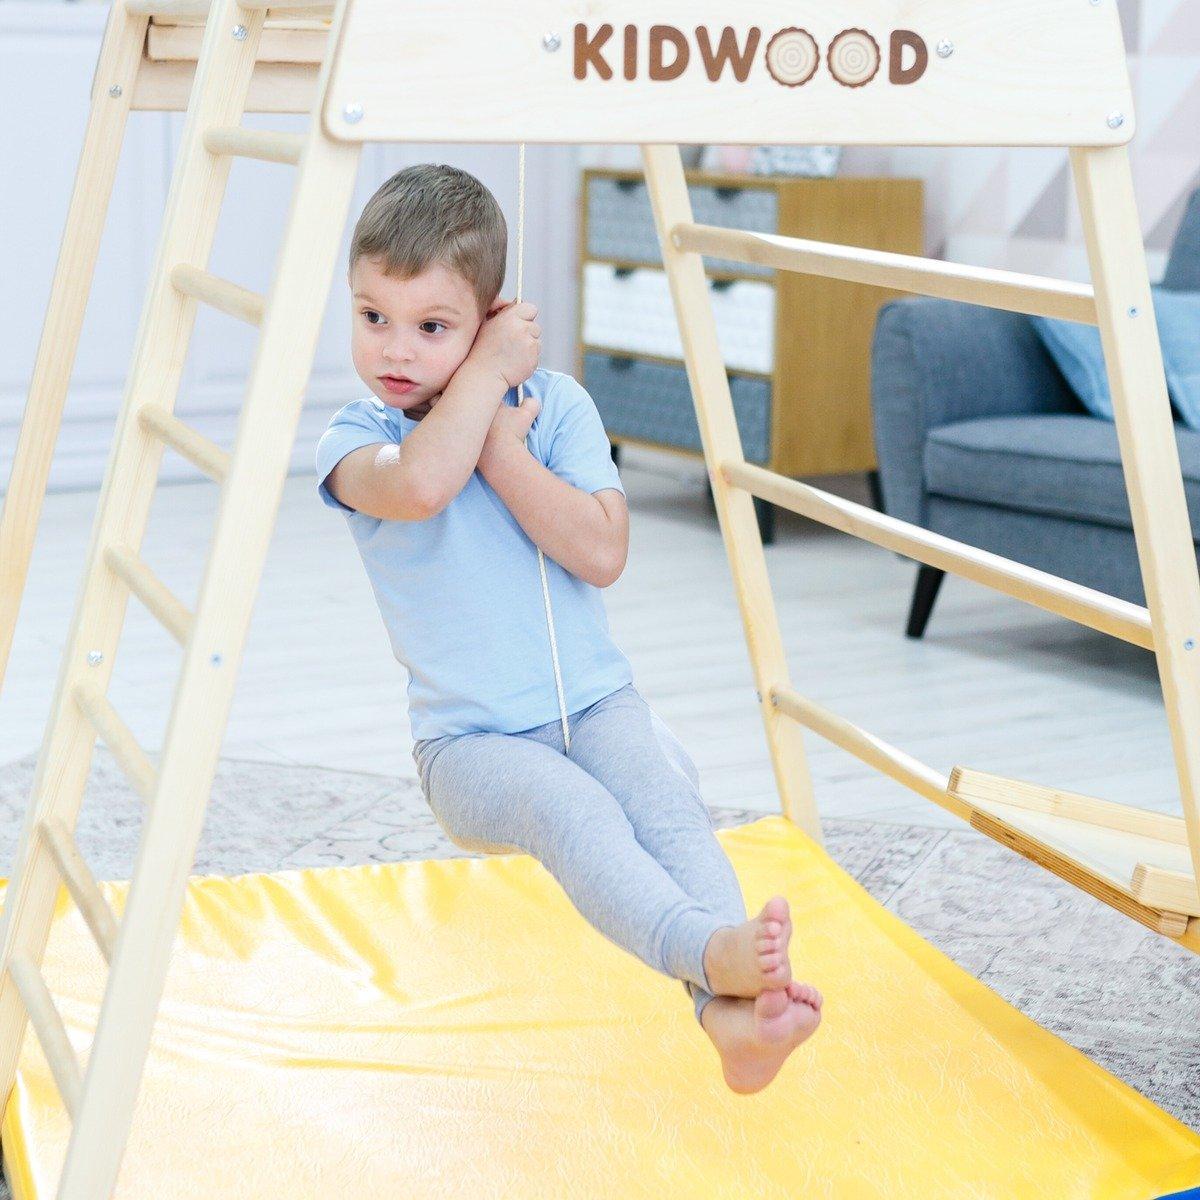 Full Size of Kidwood Klettergerüst 1 Klettergerst Rakete Sport Set Aus Holz Fr Indoor Garten Wohnzimmer Kidwood Klettergerüst